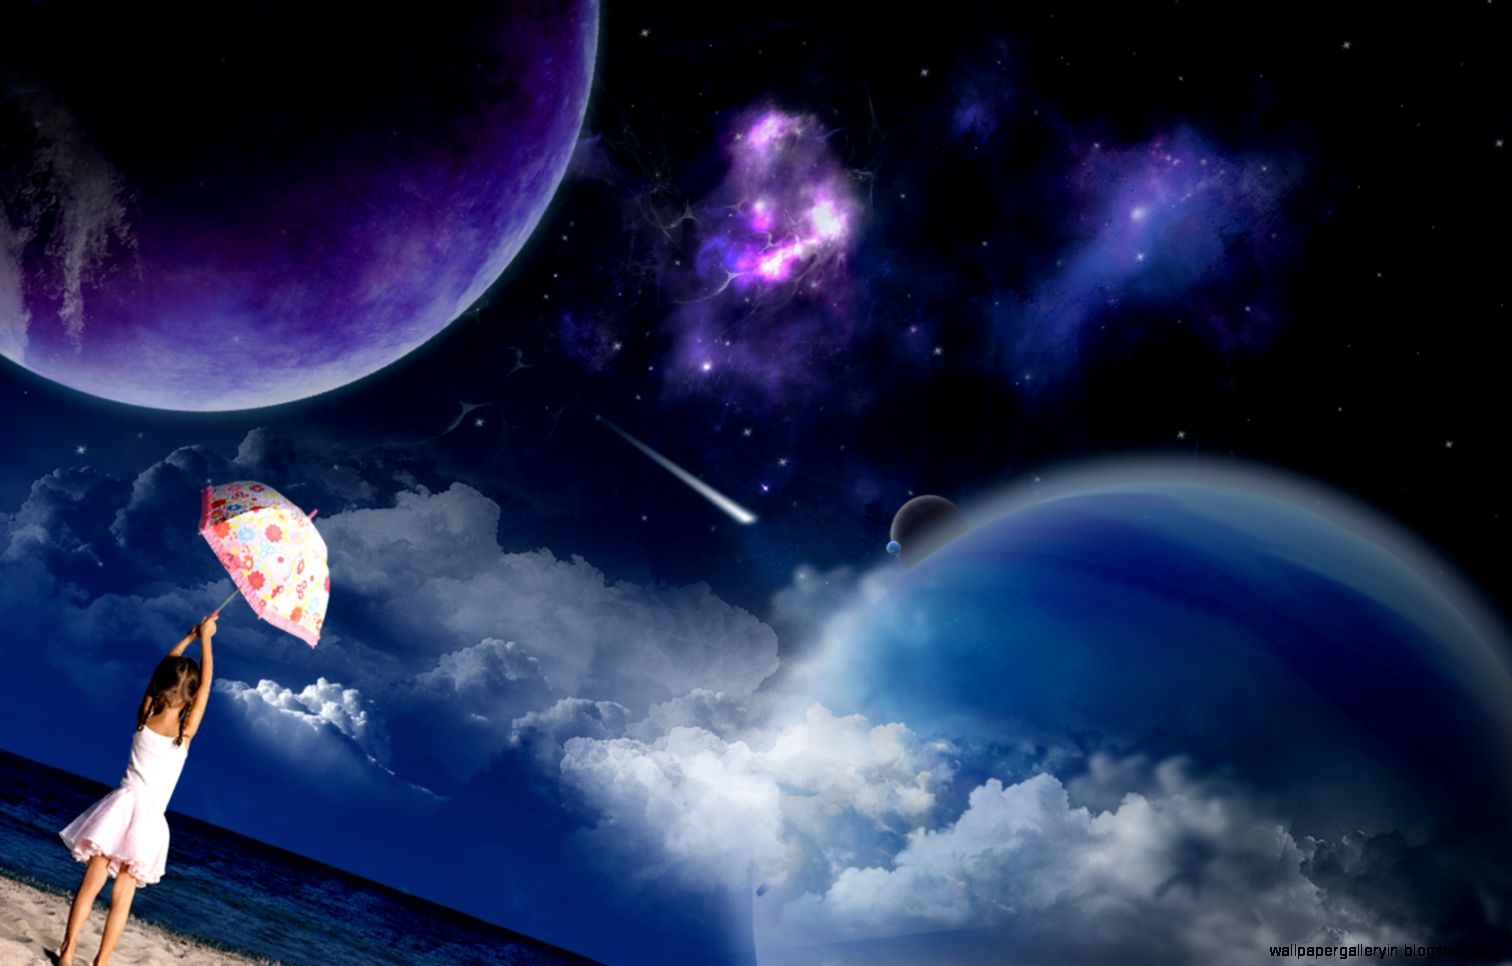 3d Space Background Wallpaper: 3D Space Planet Scene Brown Hd Wallpaper